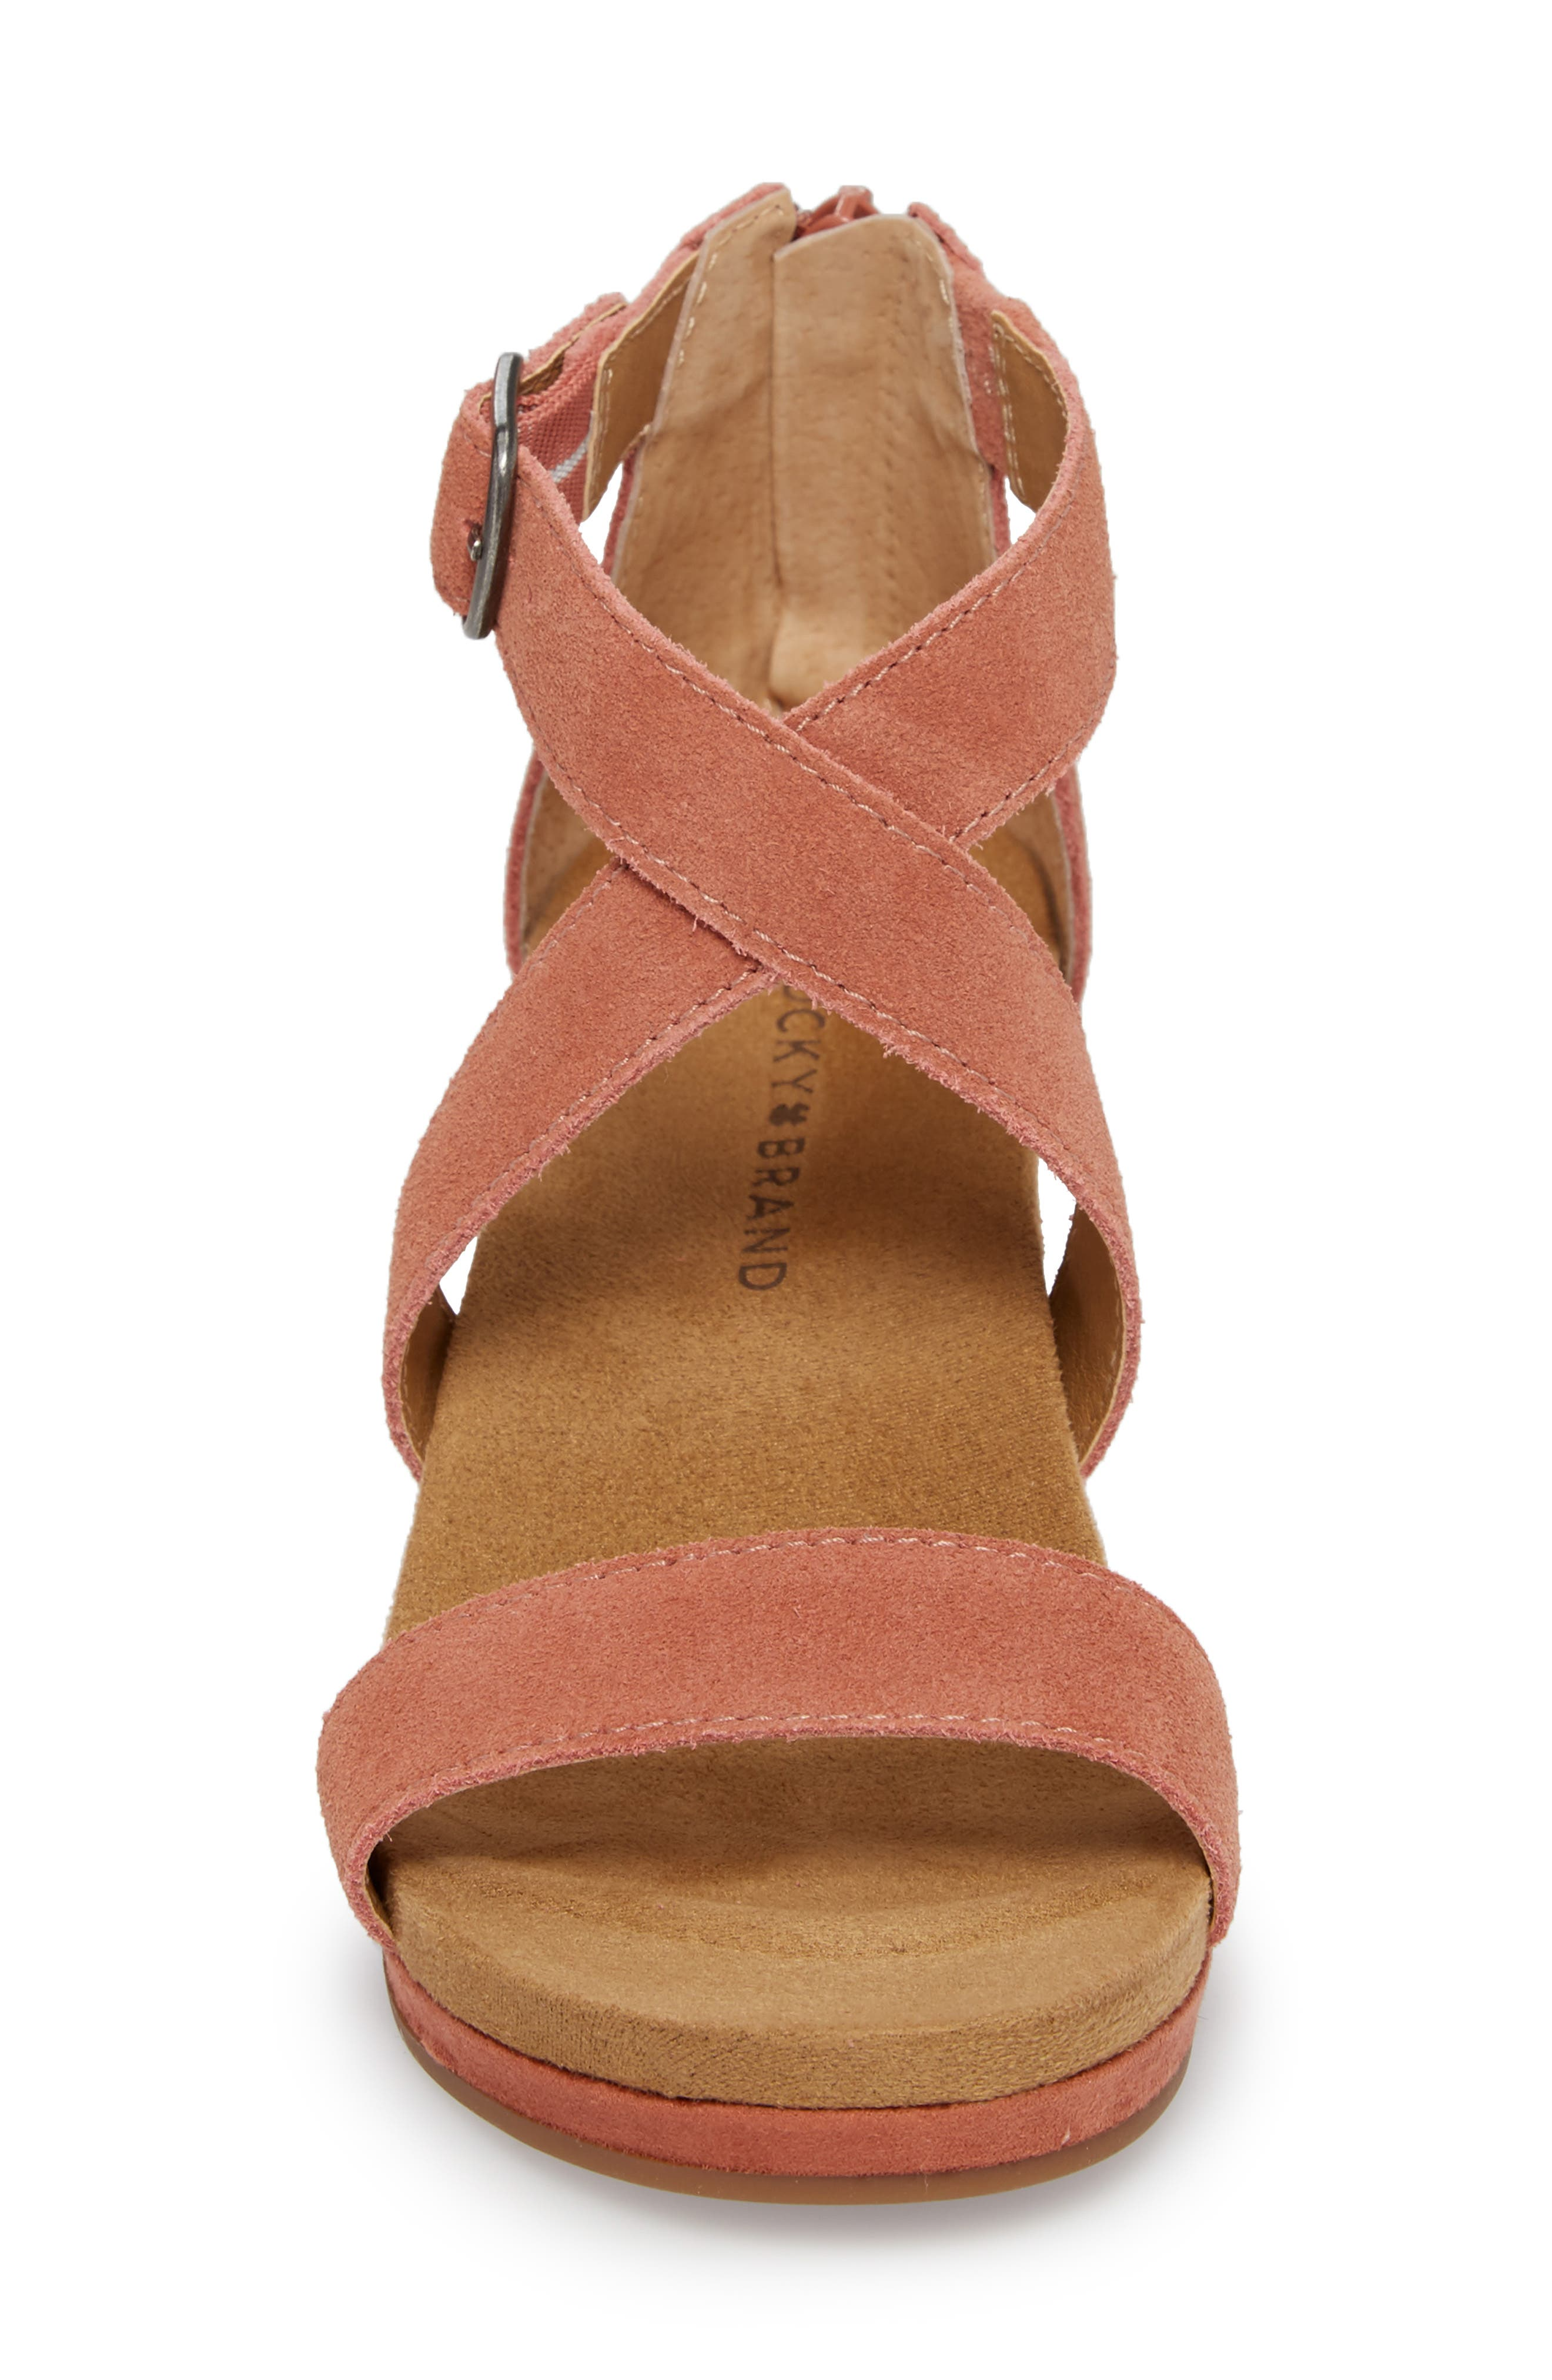 Kenadee Wedge Sandal,                             Alternate thumbnail 4, color,                             Canyon Rose Suede